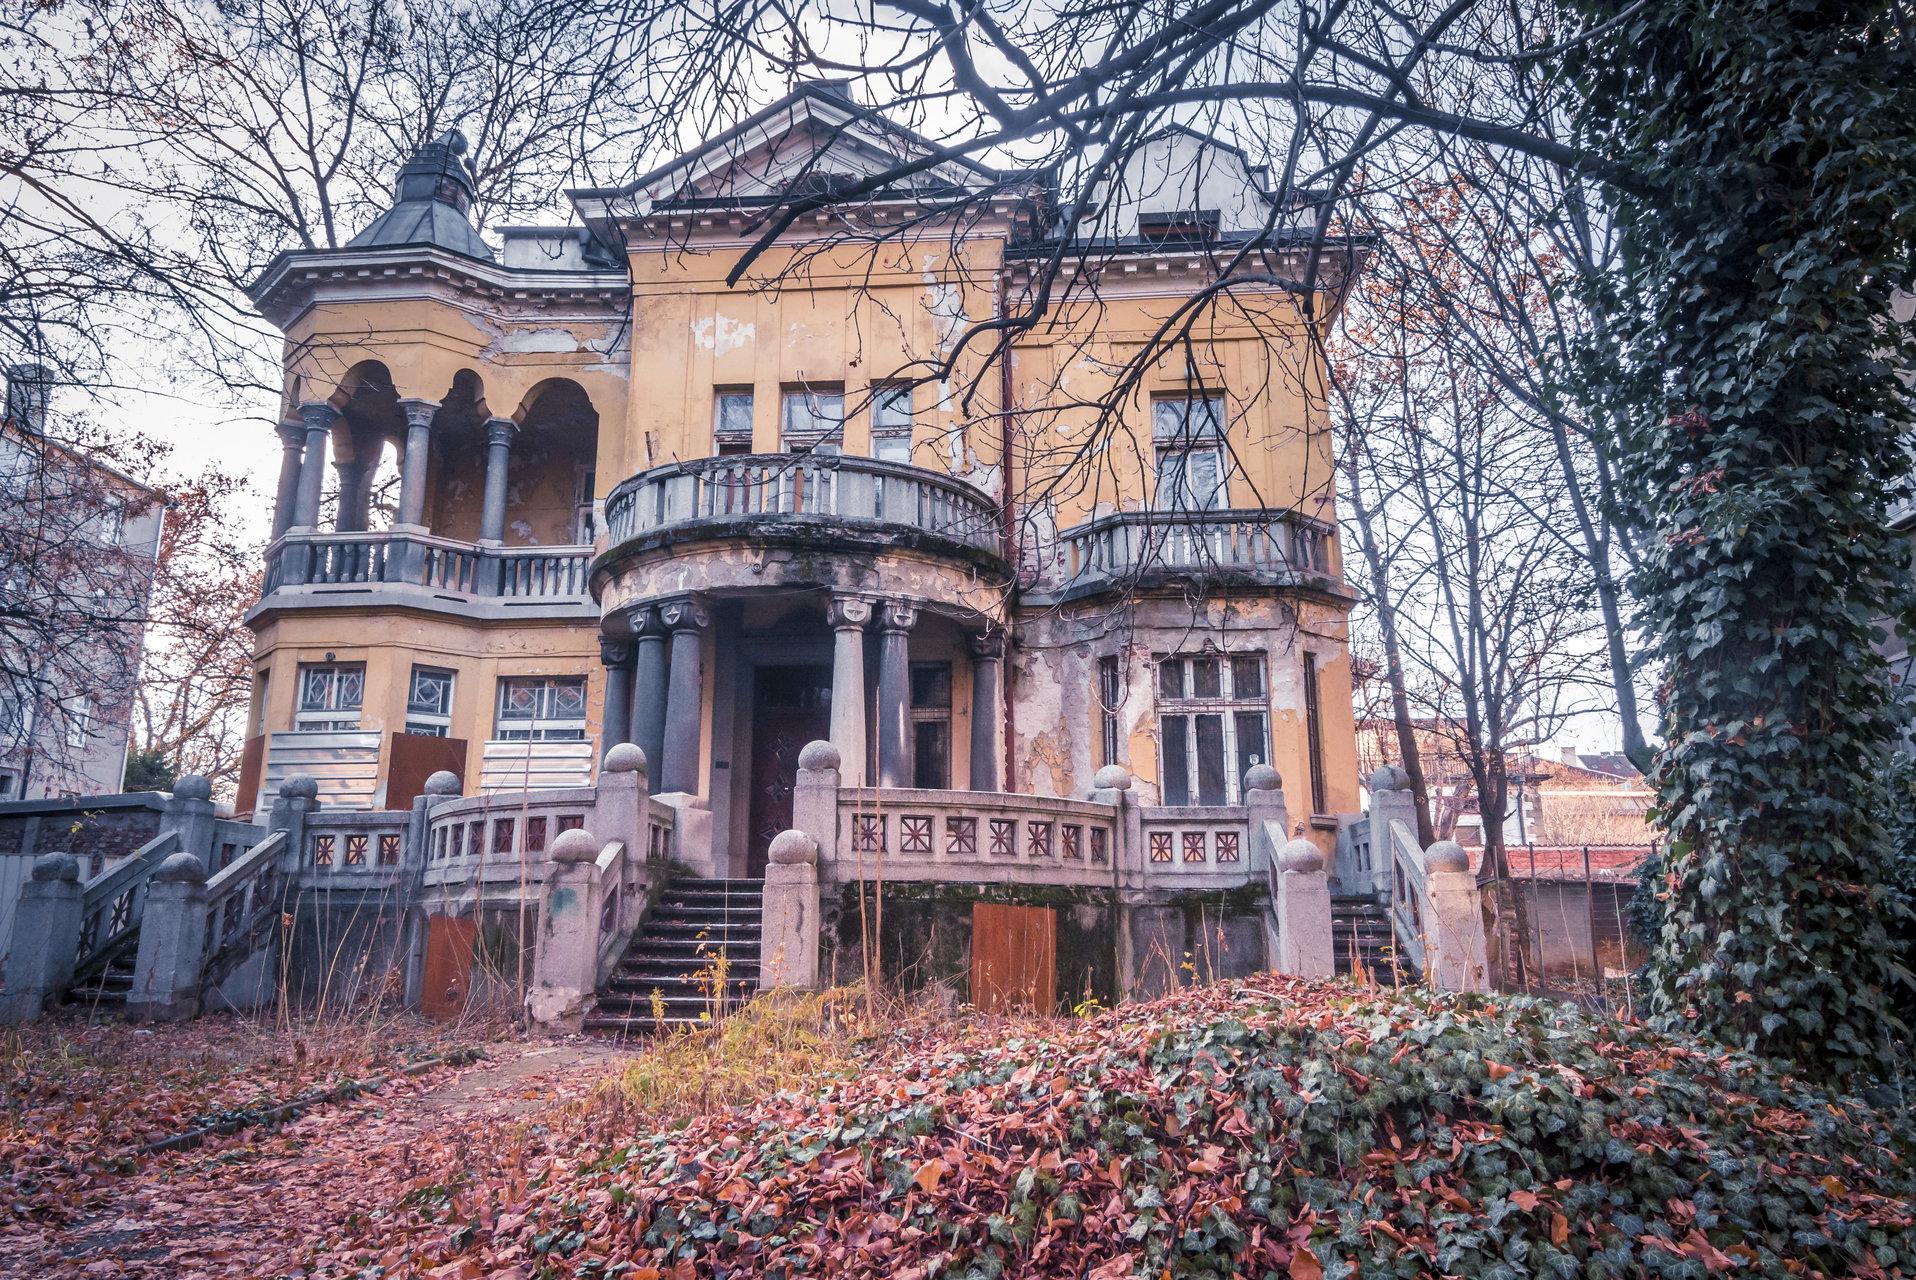 Забравената къща | Author Ivan Ar - tomekki | PHOTO FORUM